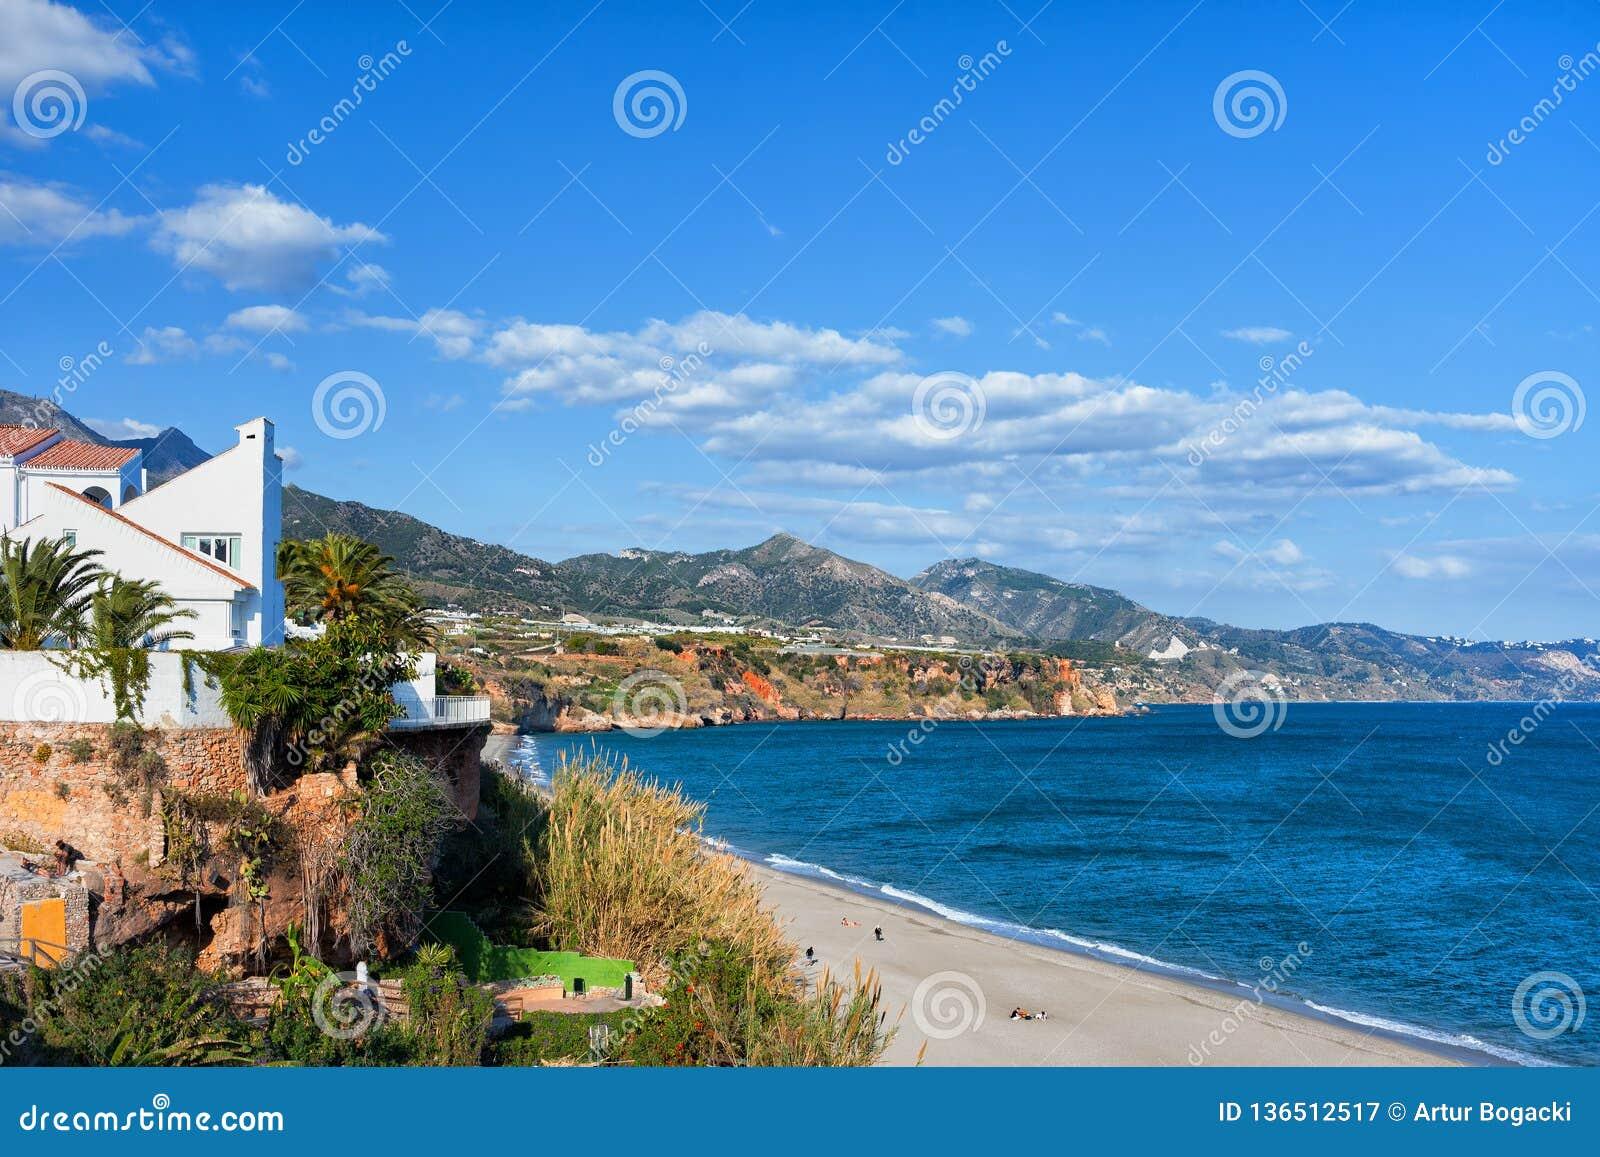 Городок Nerja на Косте del Sol в Испании